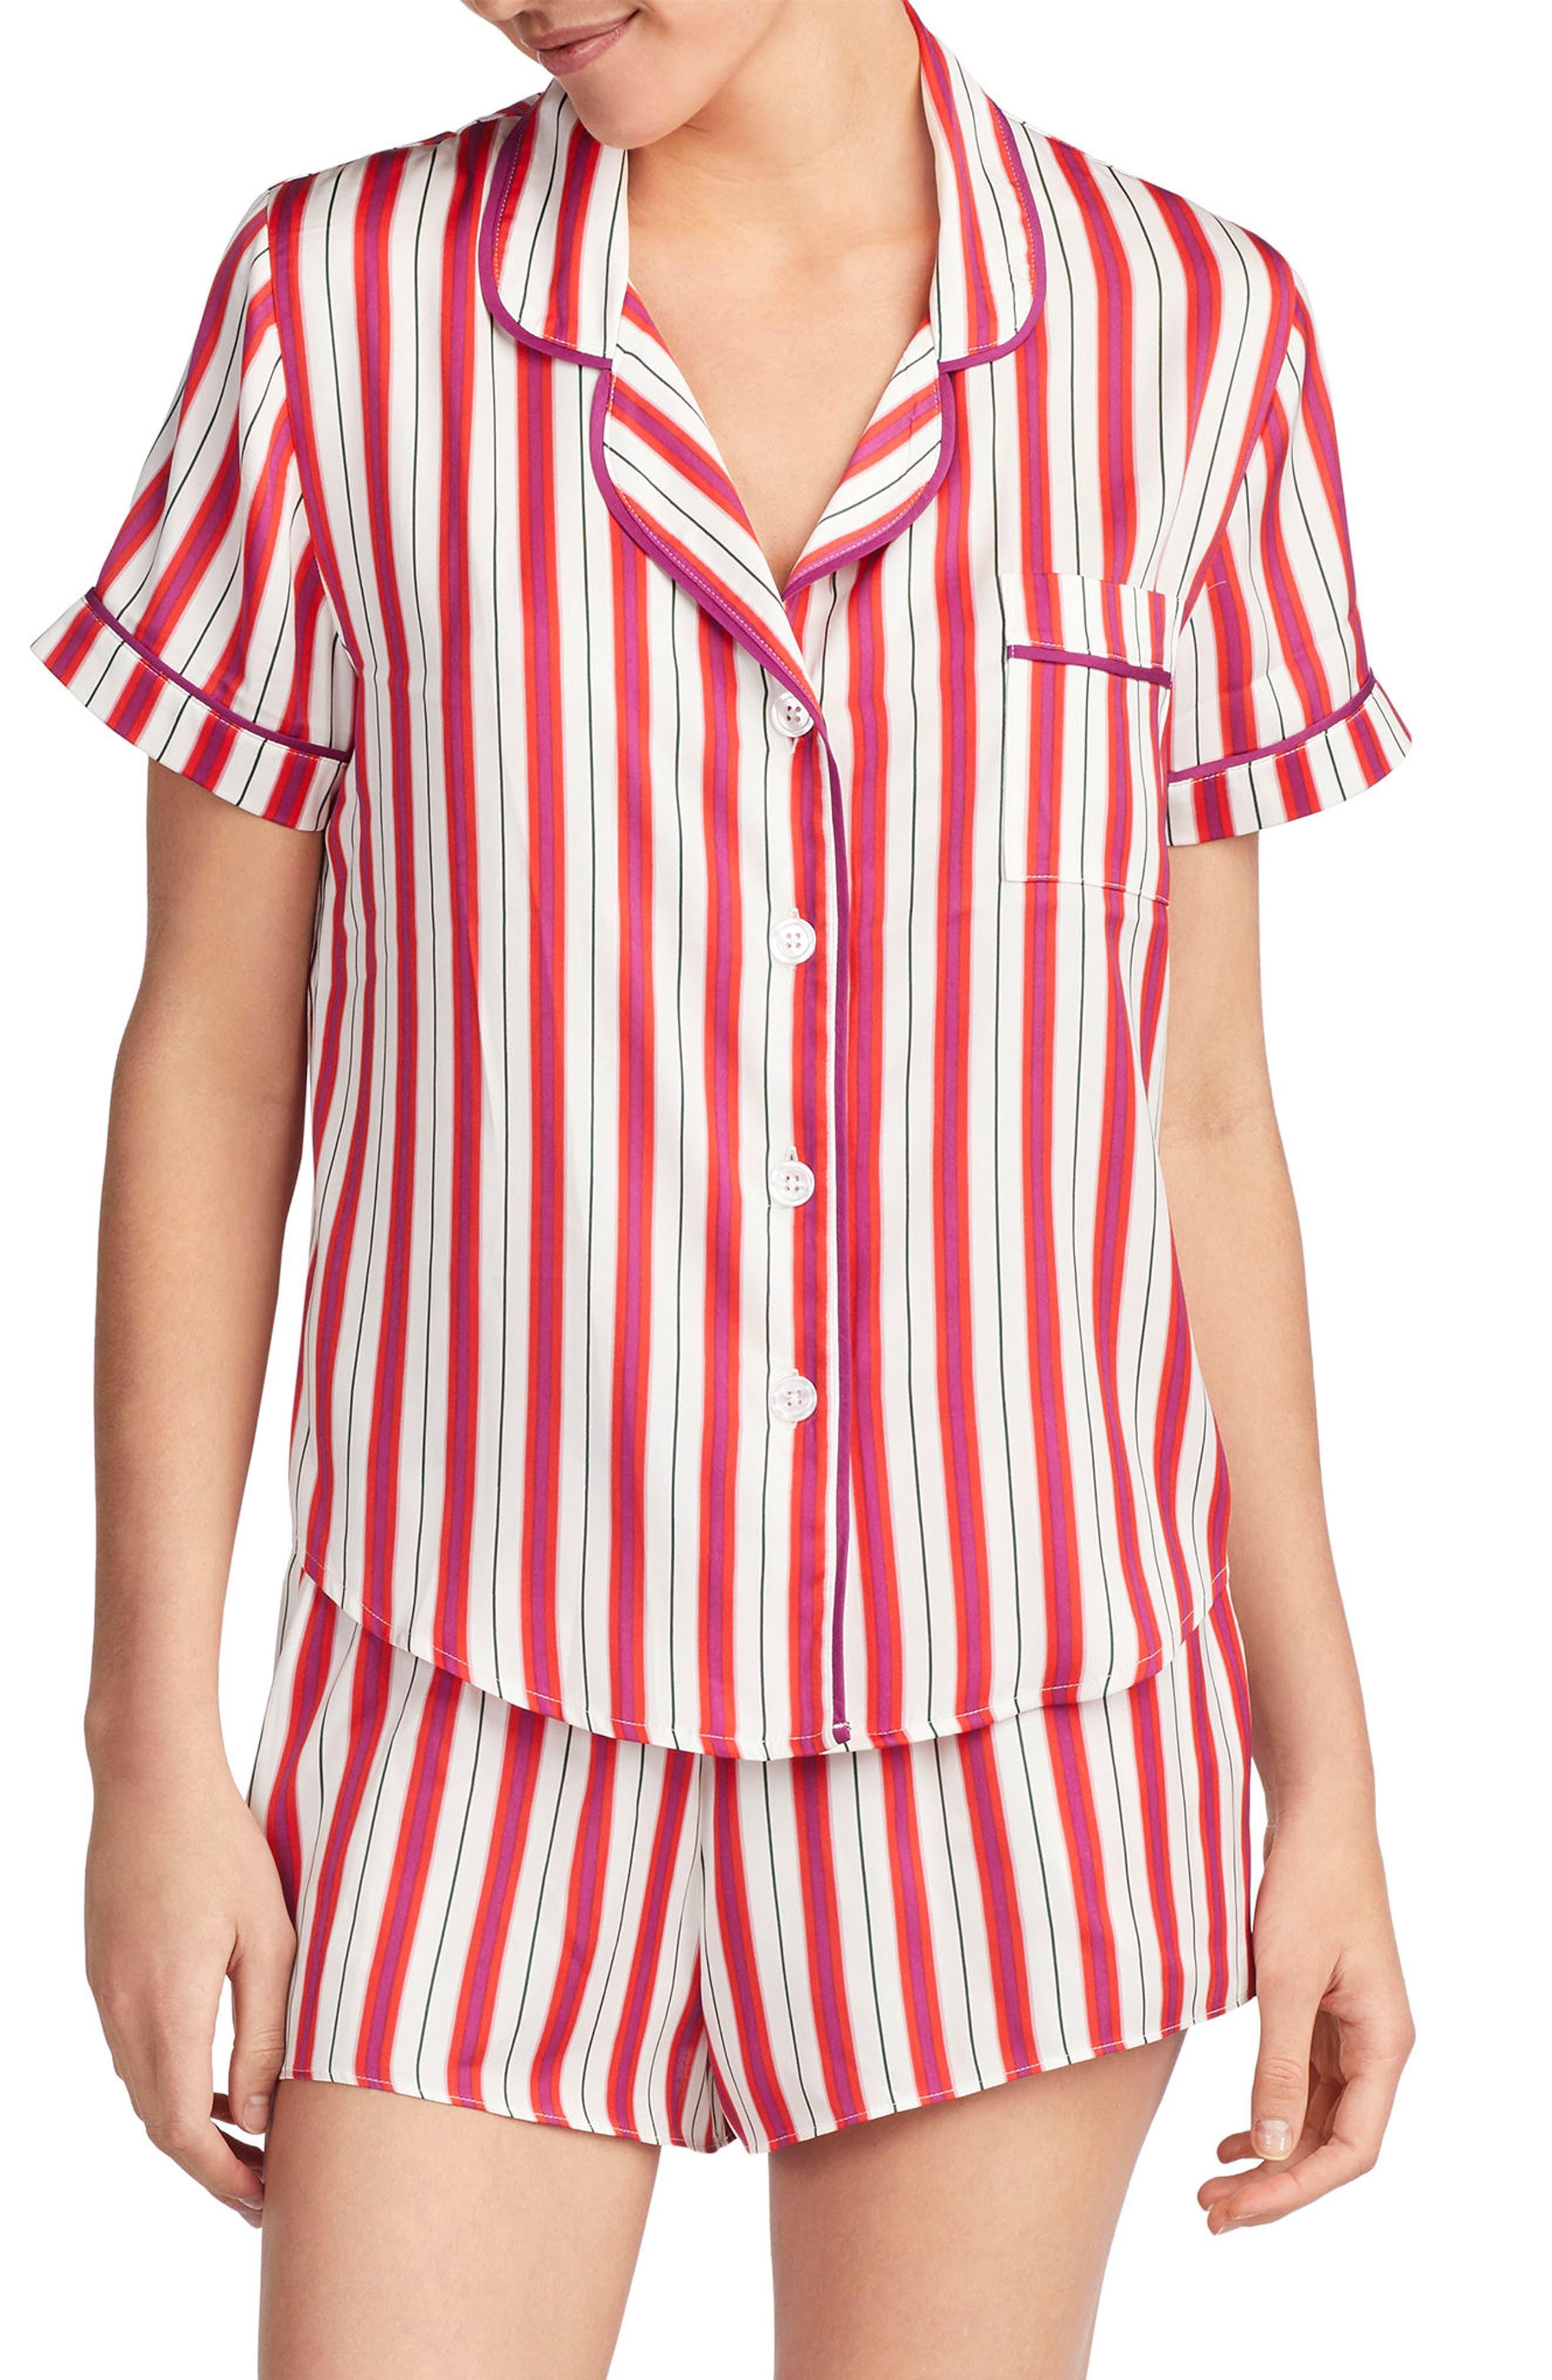 Room Service Satin Pajama Top